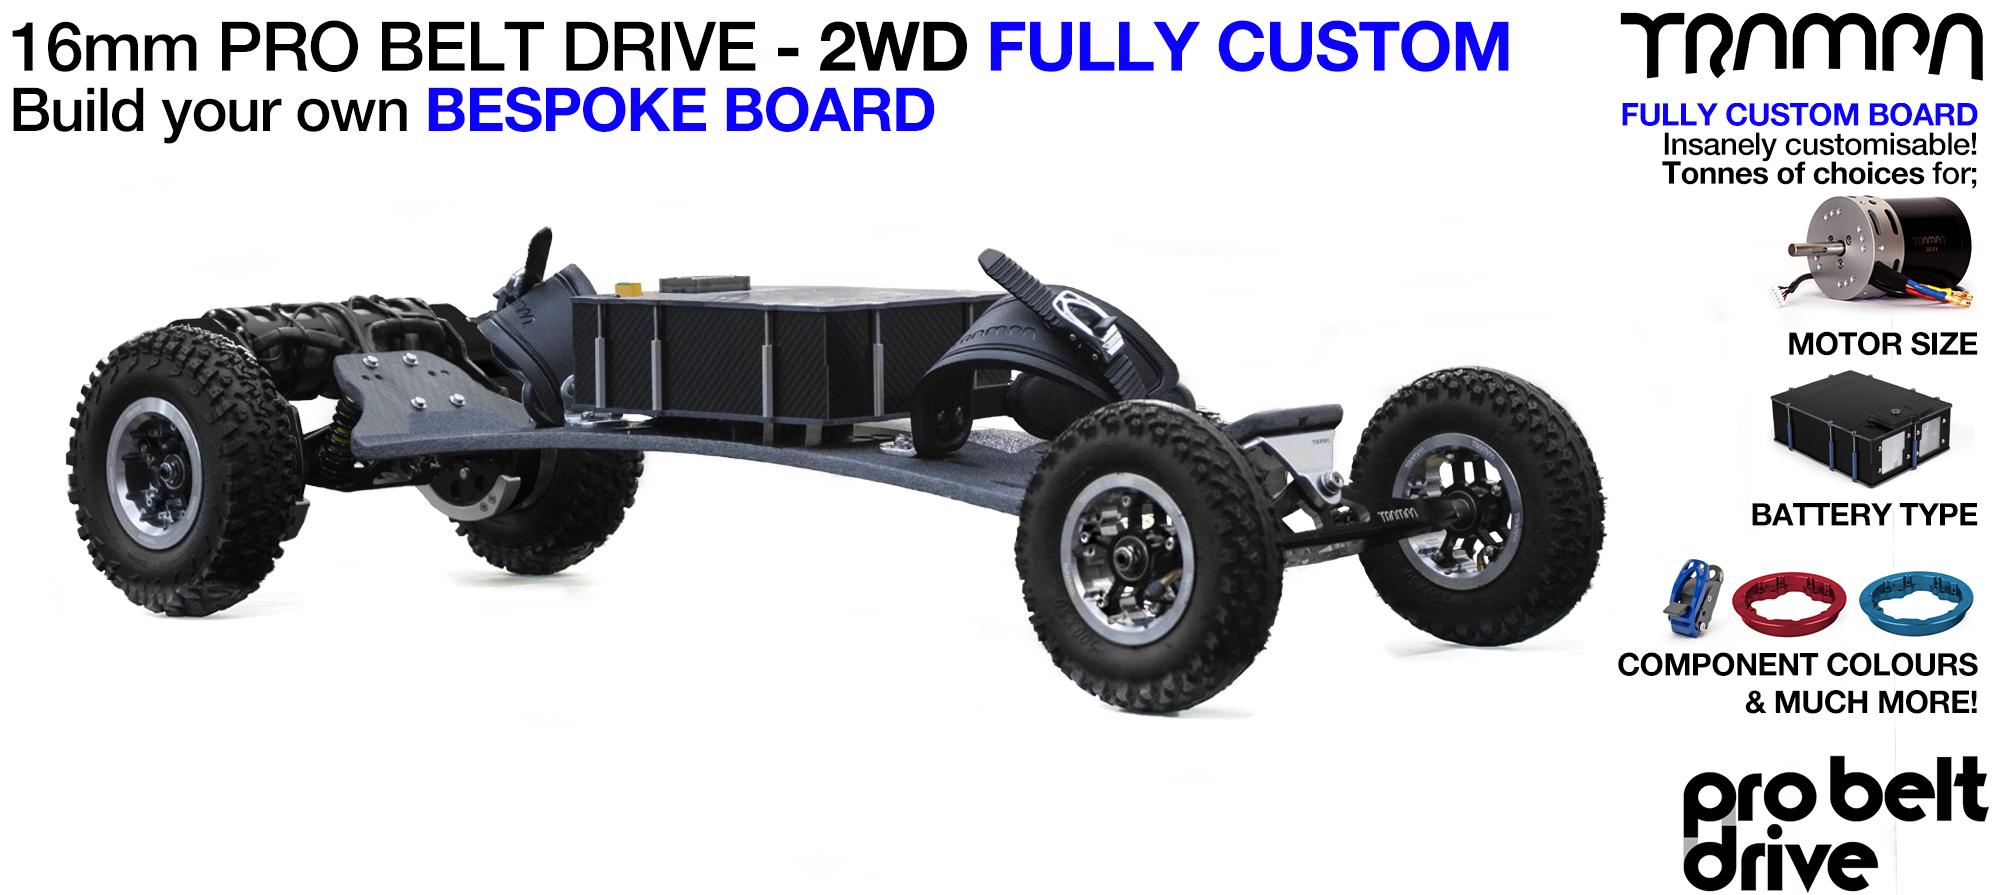 Electric Mountainboard PRO BELT DRIVE - Custom